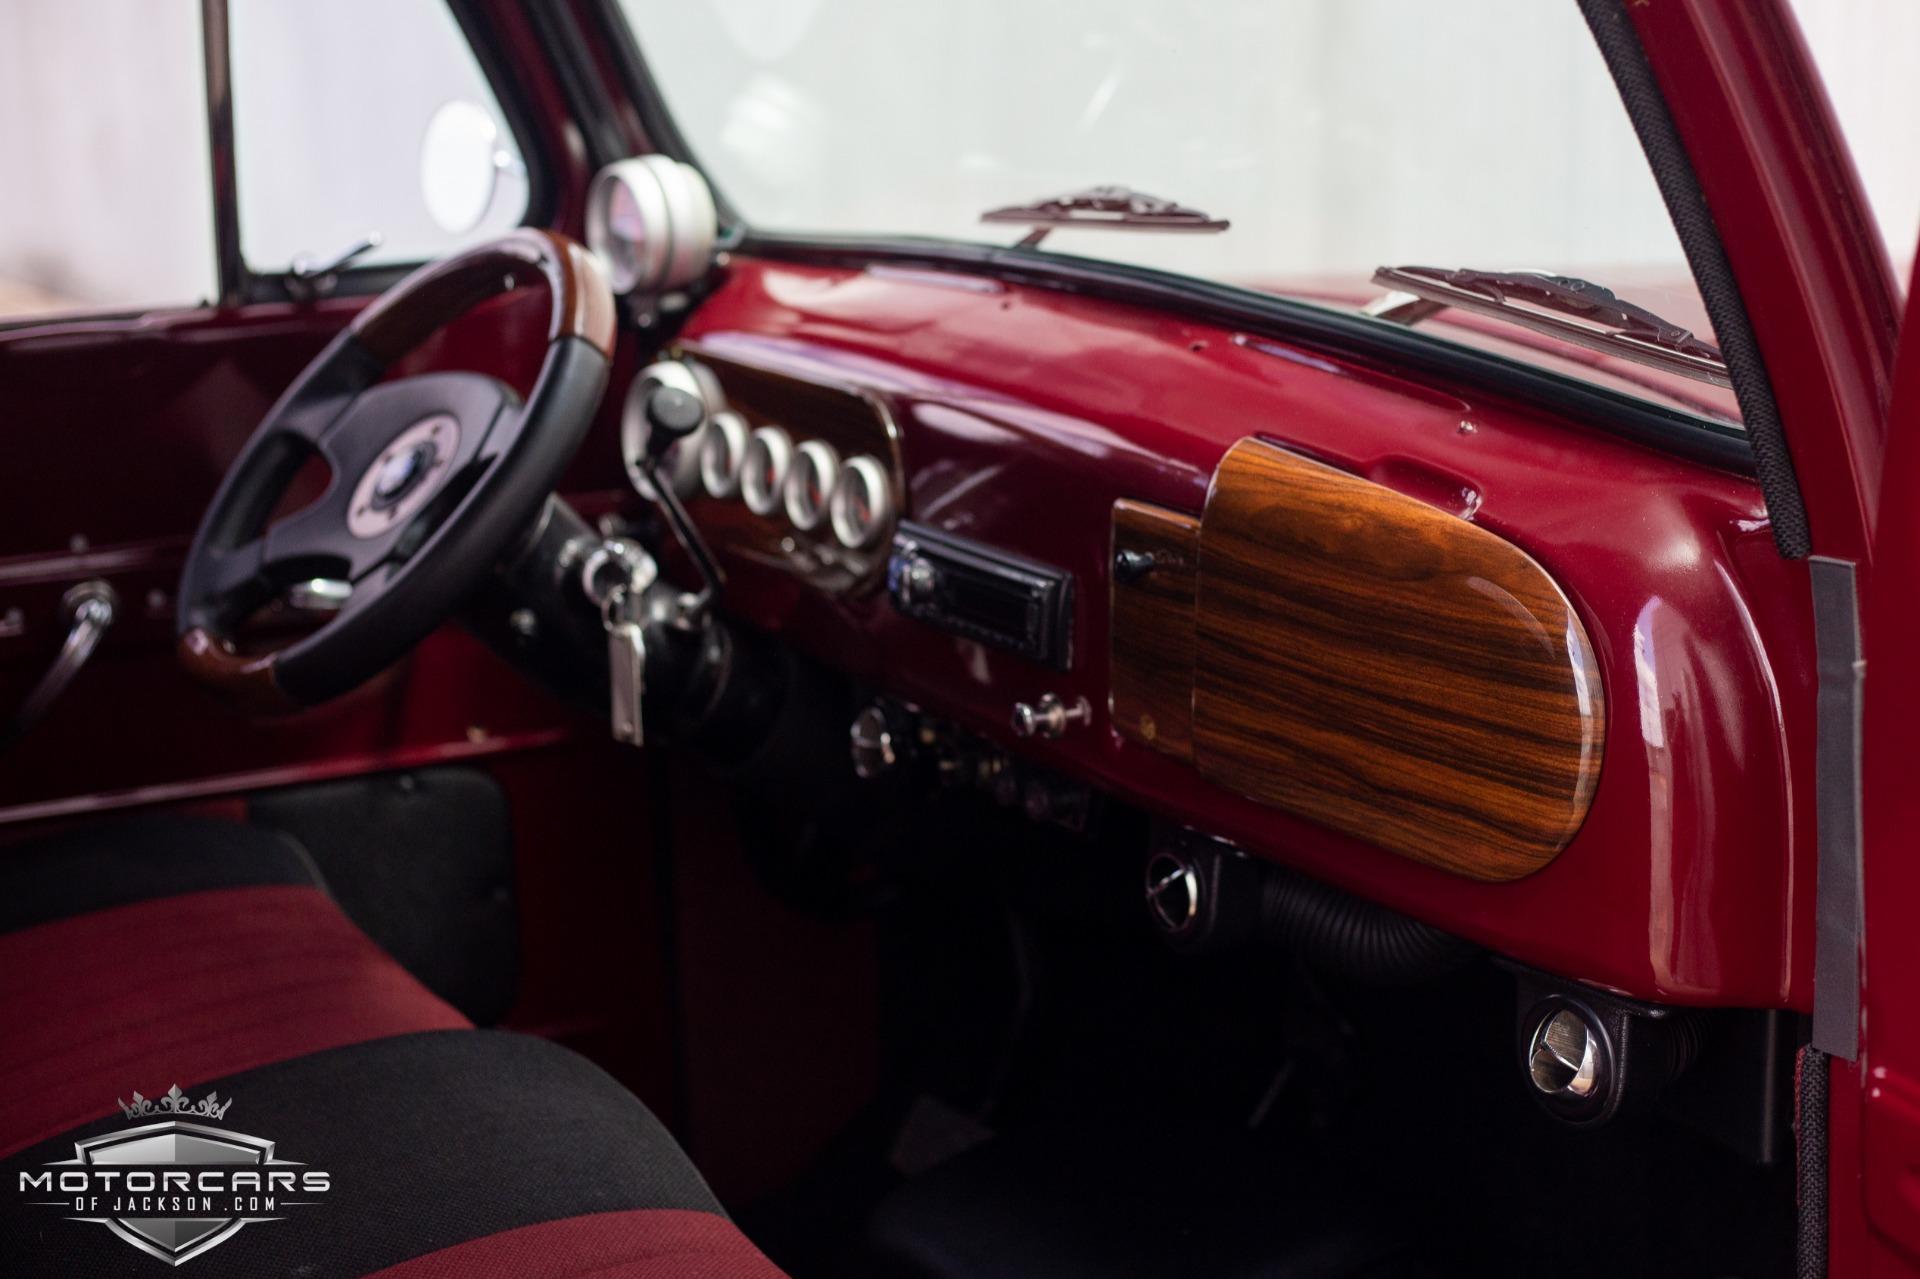 Used-1950-Ford-F1-Pickup-Jackson-MS